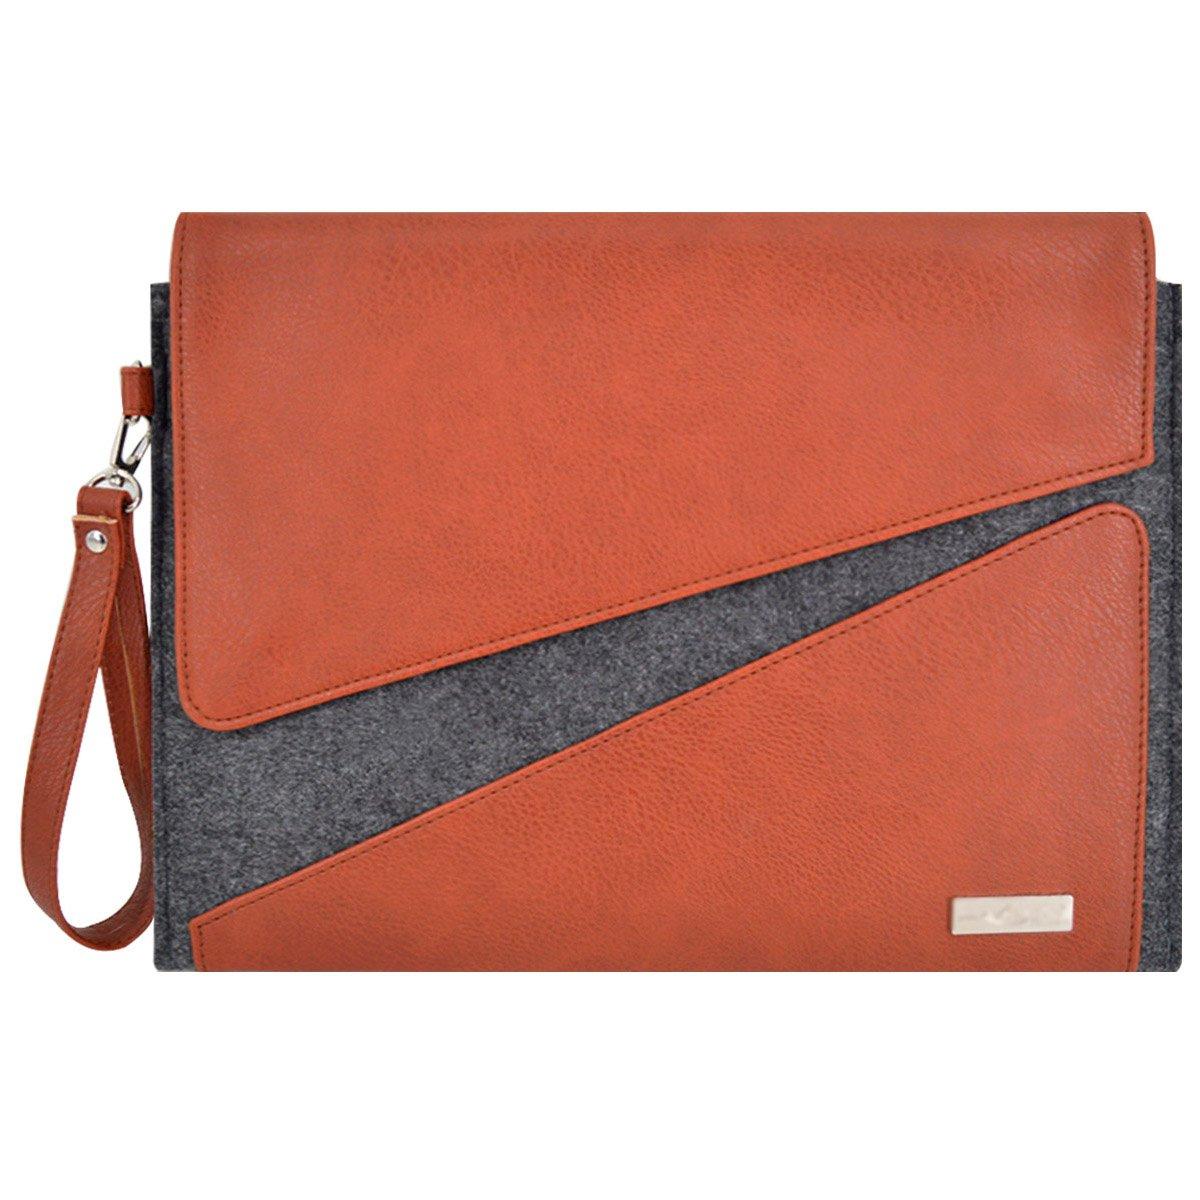 Felice Men PU Leather A4 Document Bag Holder Business Envelope Clutch Purse with Wristlet